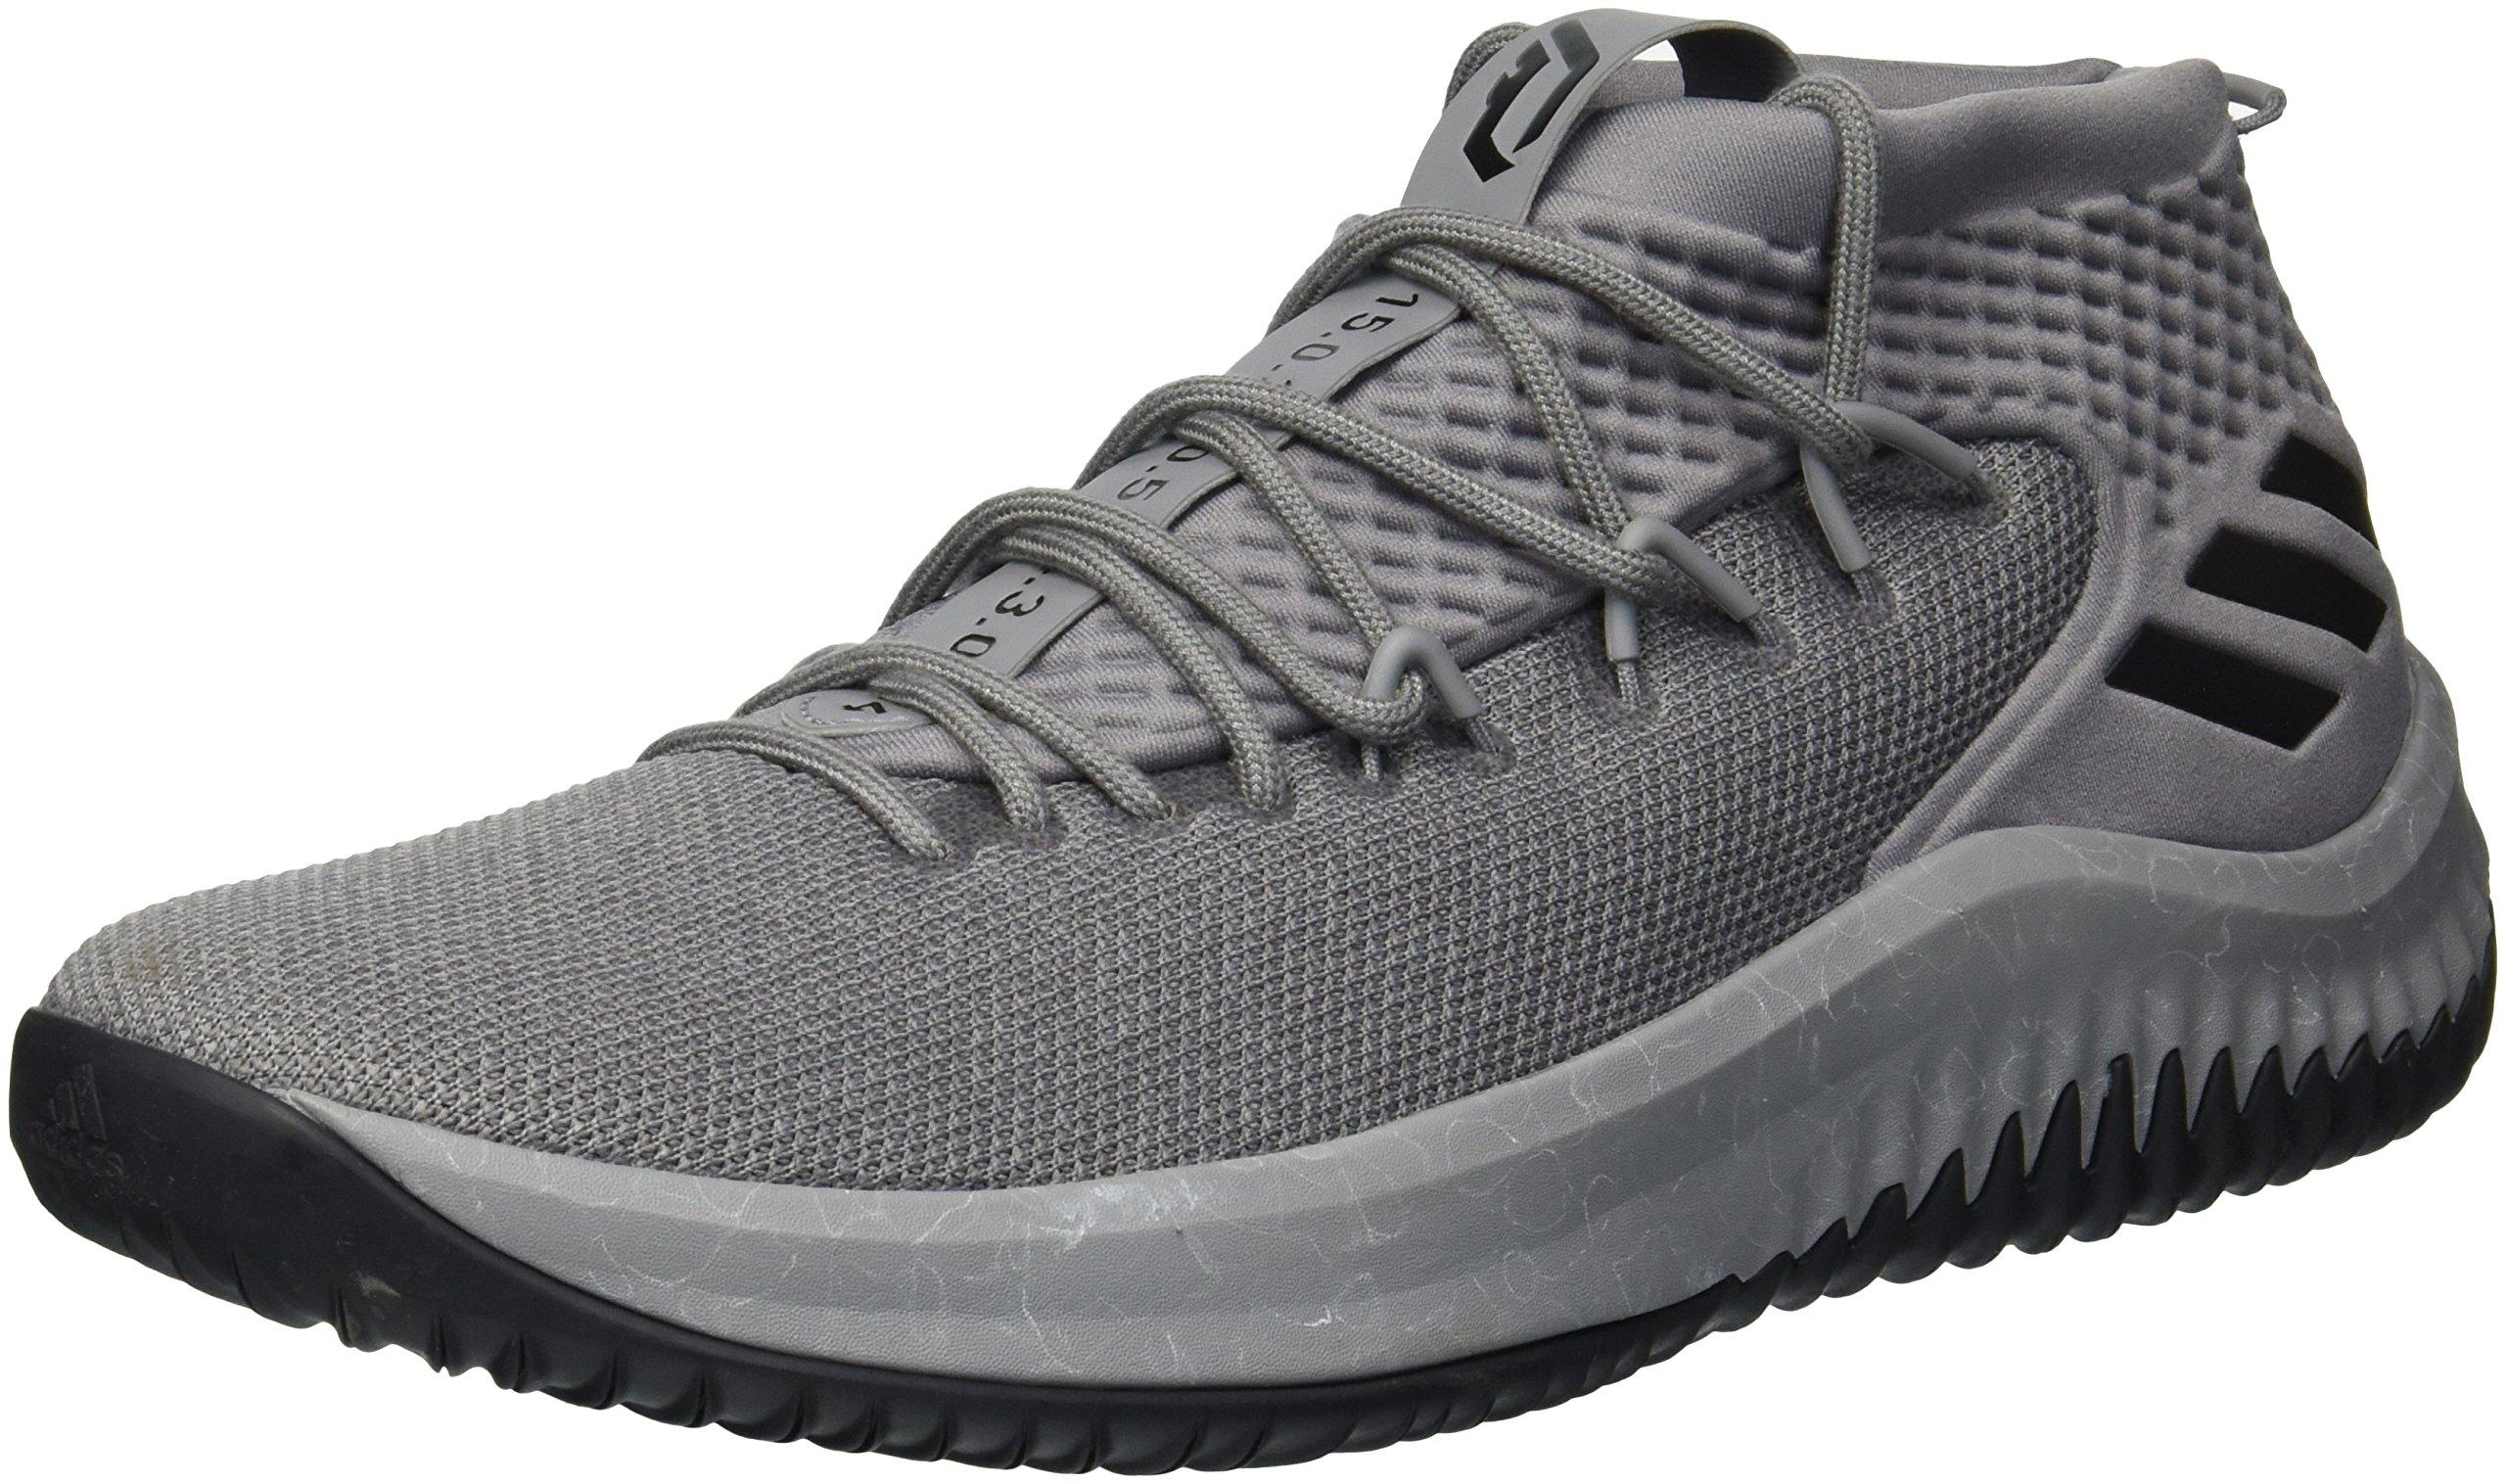 adidas Men's Crazy Time II Football Shoe, Grey Three/Core Black/Grey Two, 9 M US